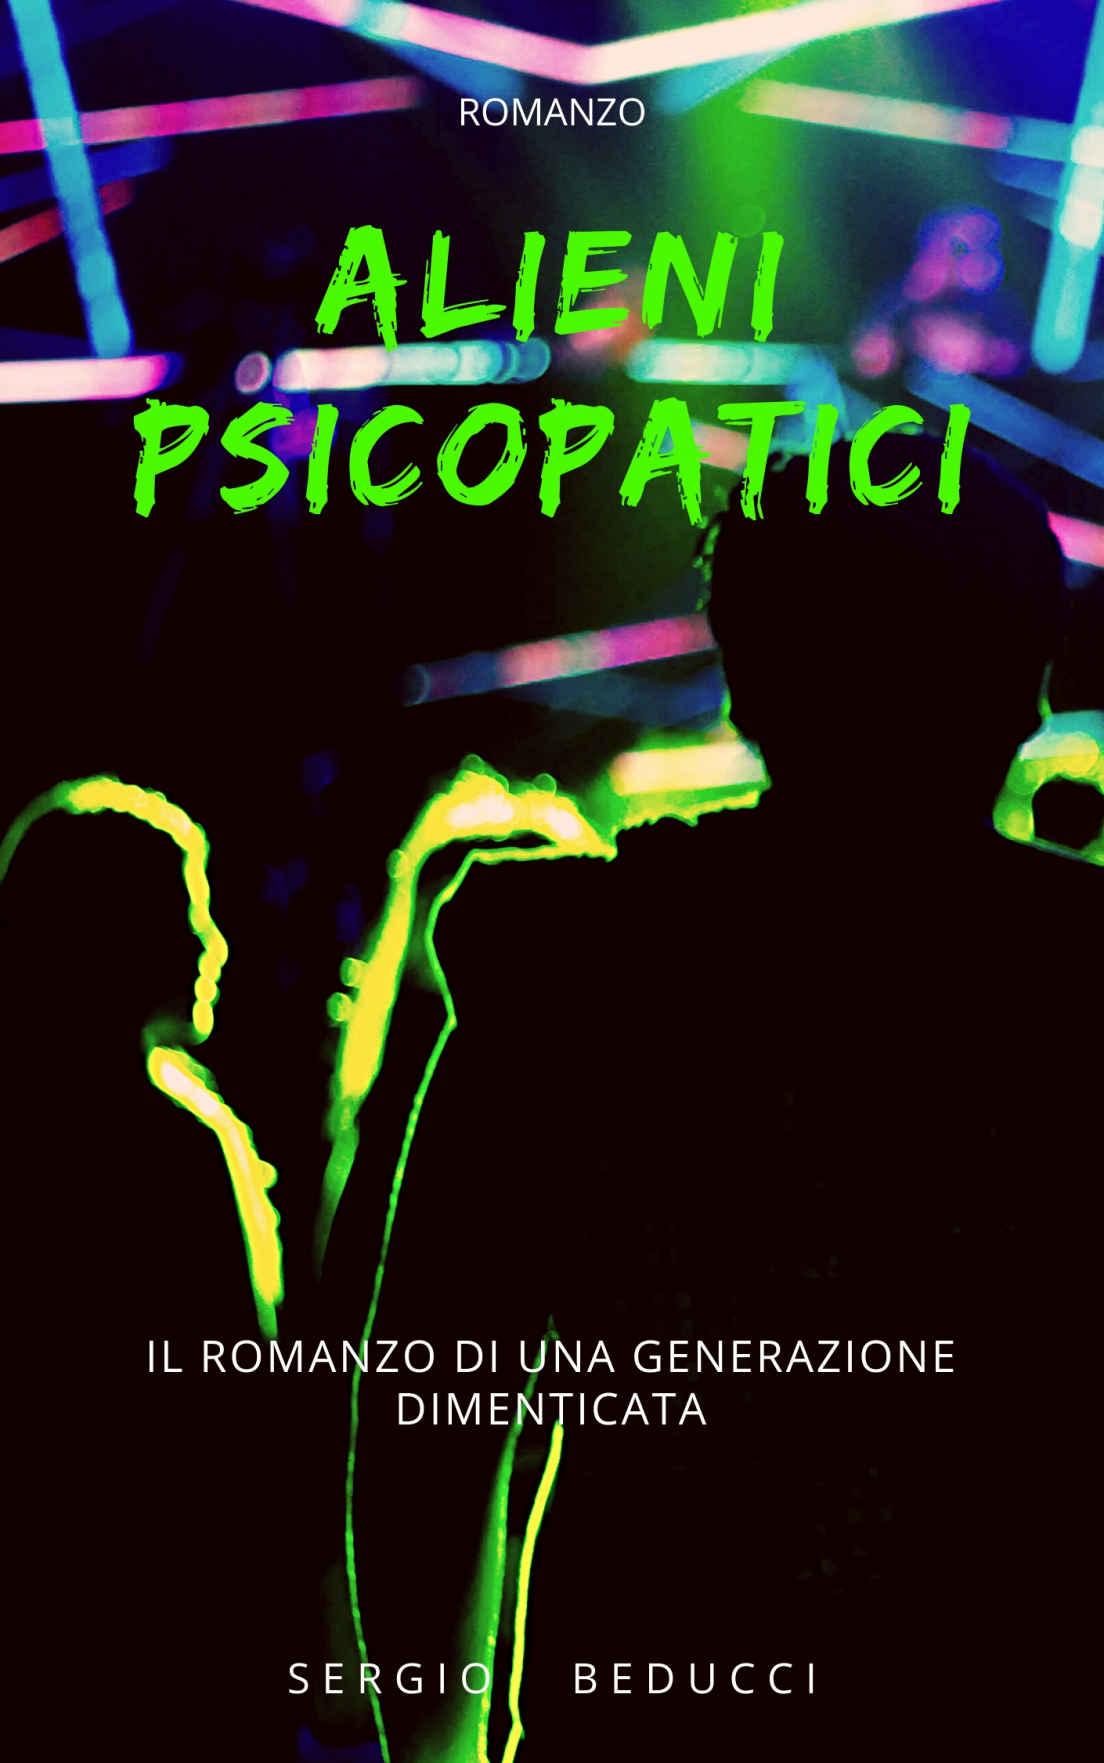 alieni psicopatici